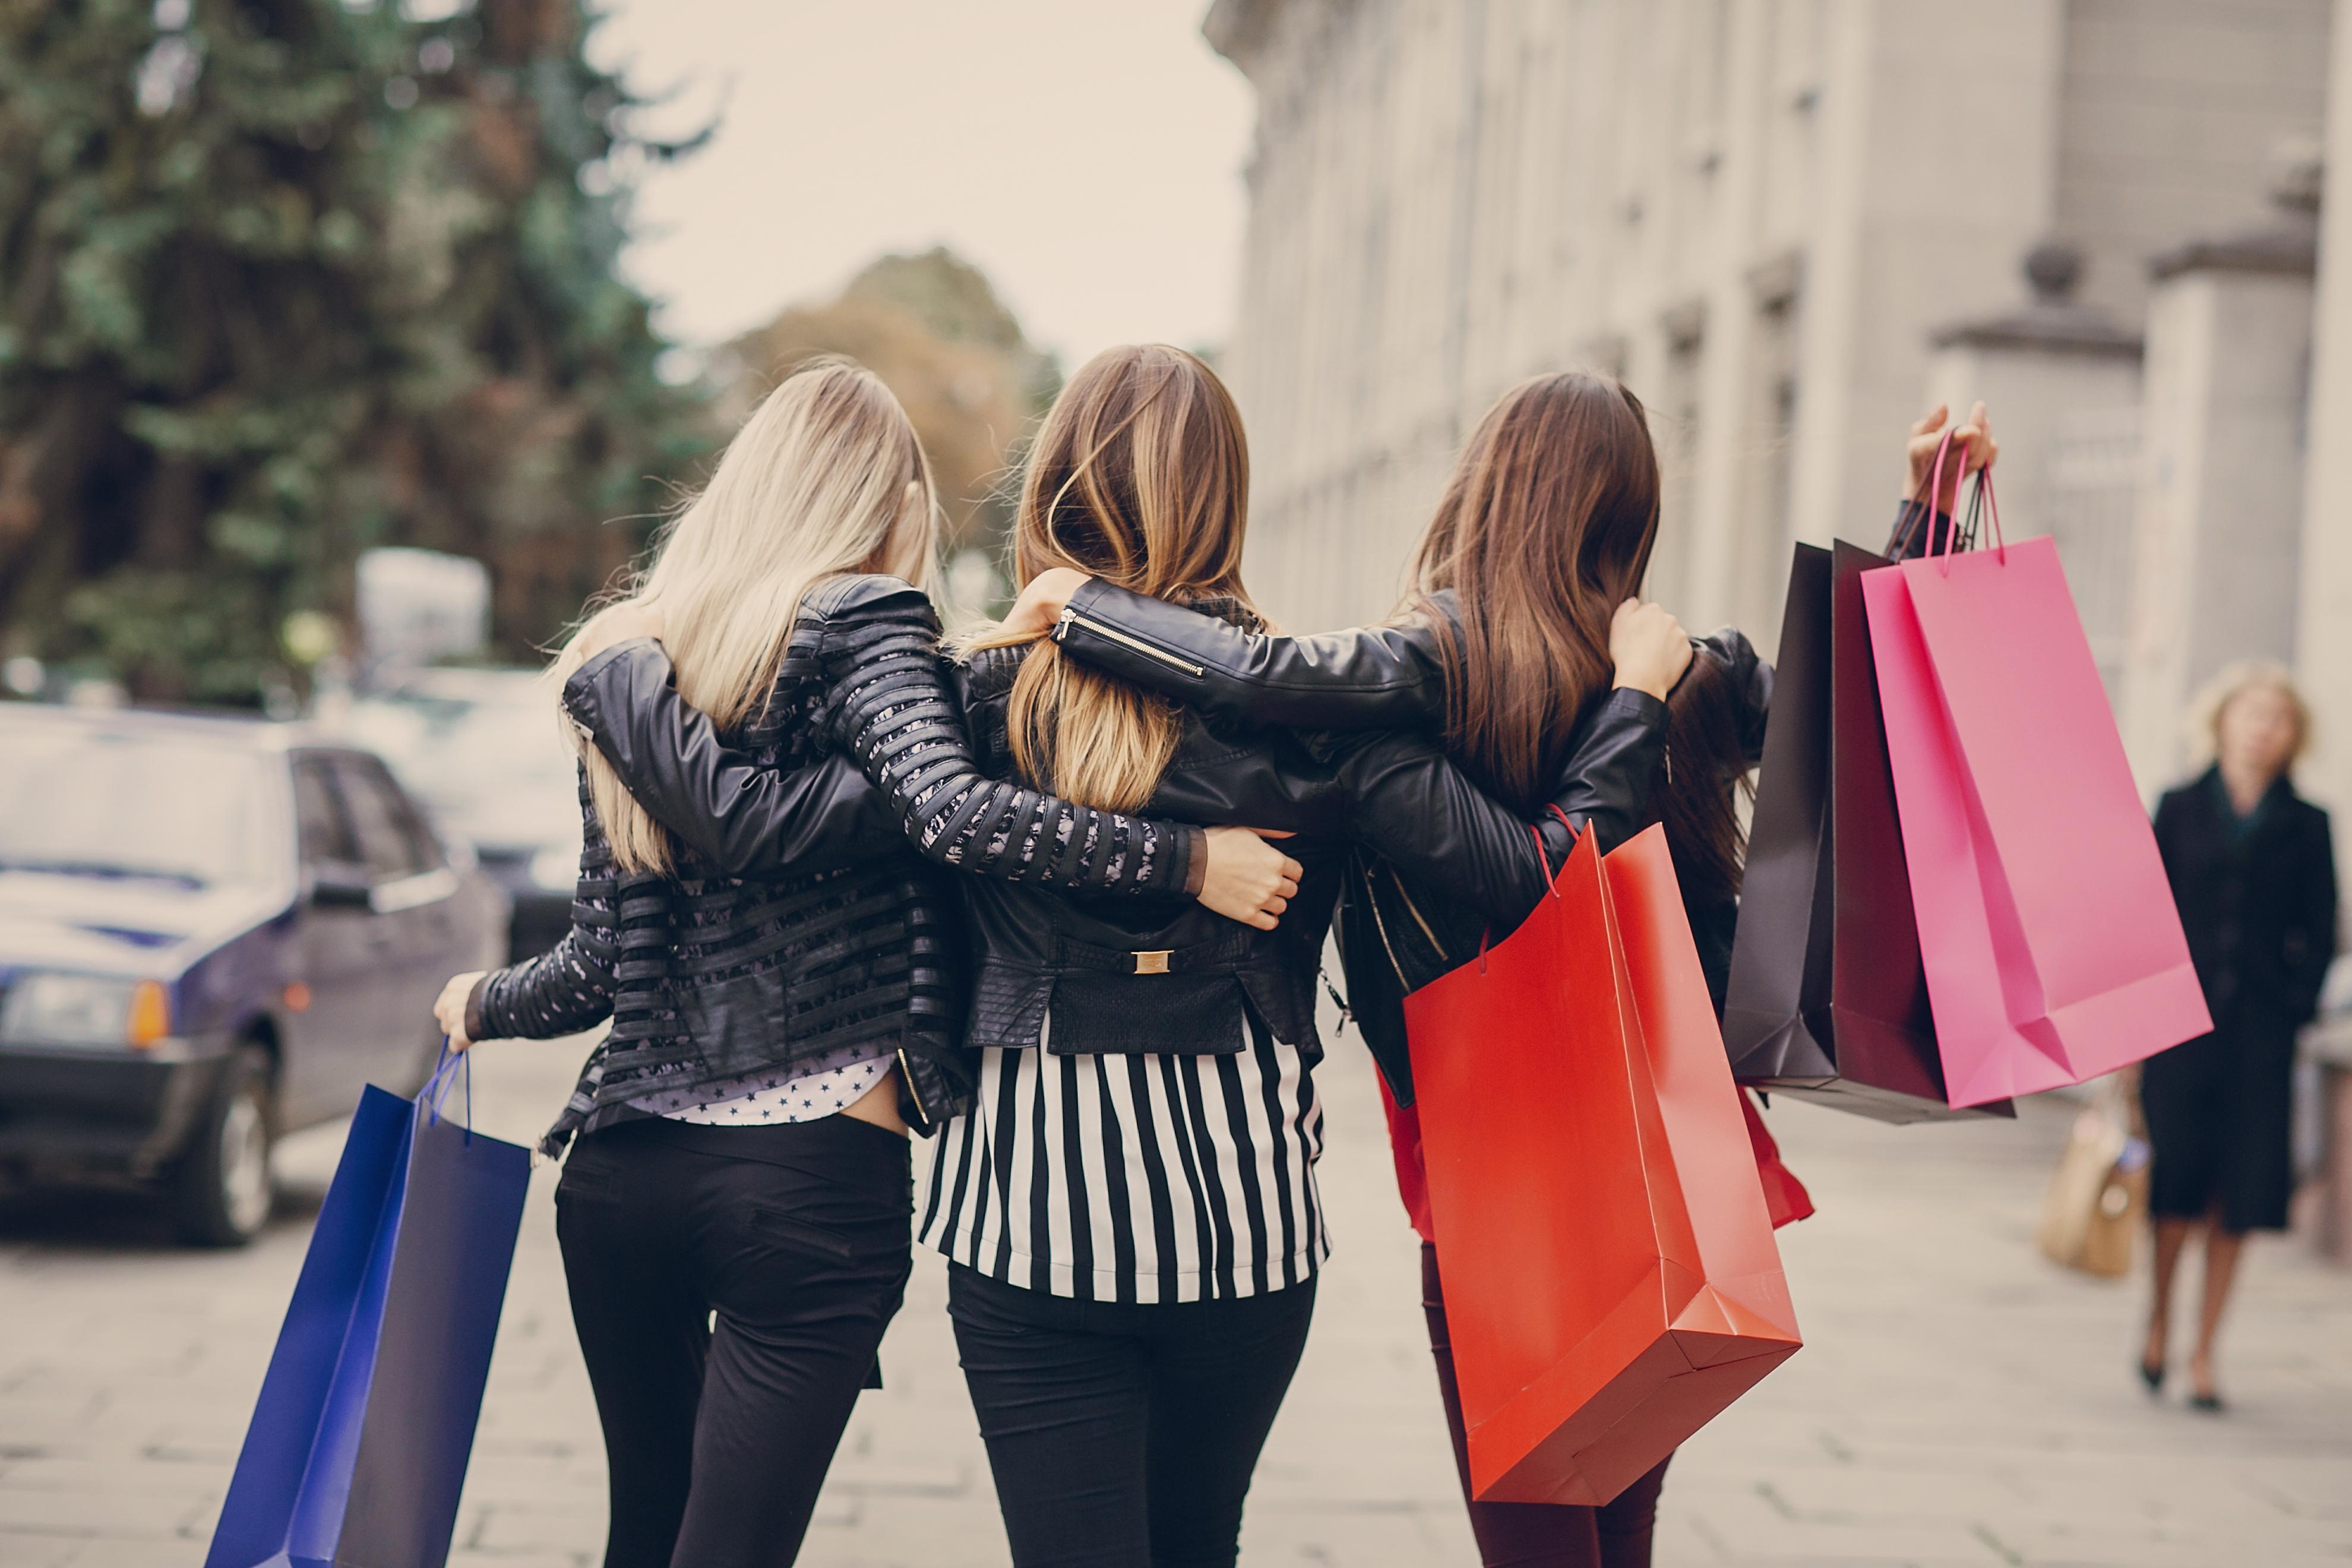 Young women walking outside of a mall carrying shopping bags.